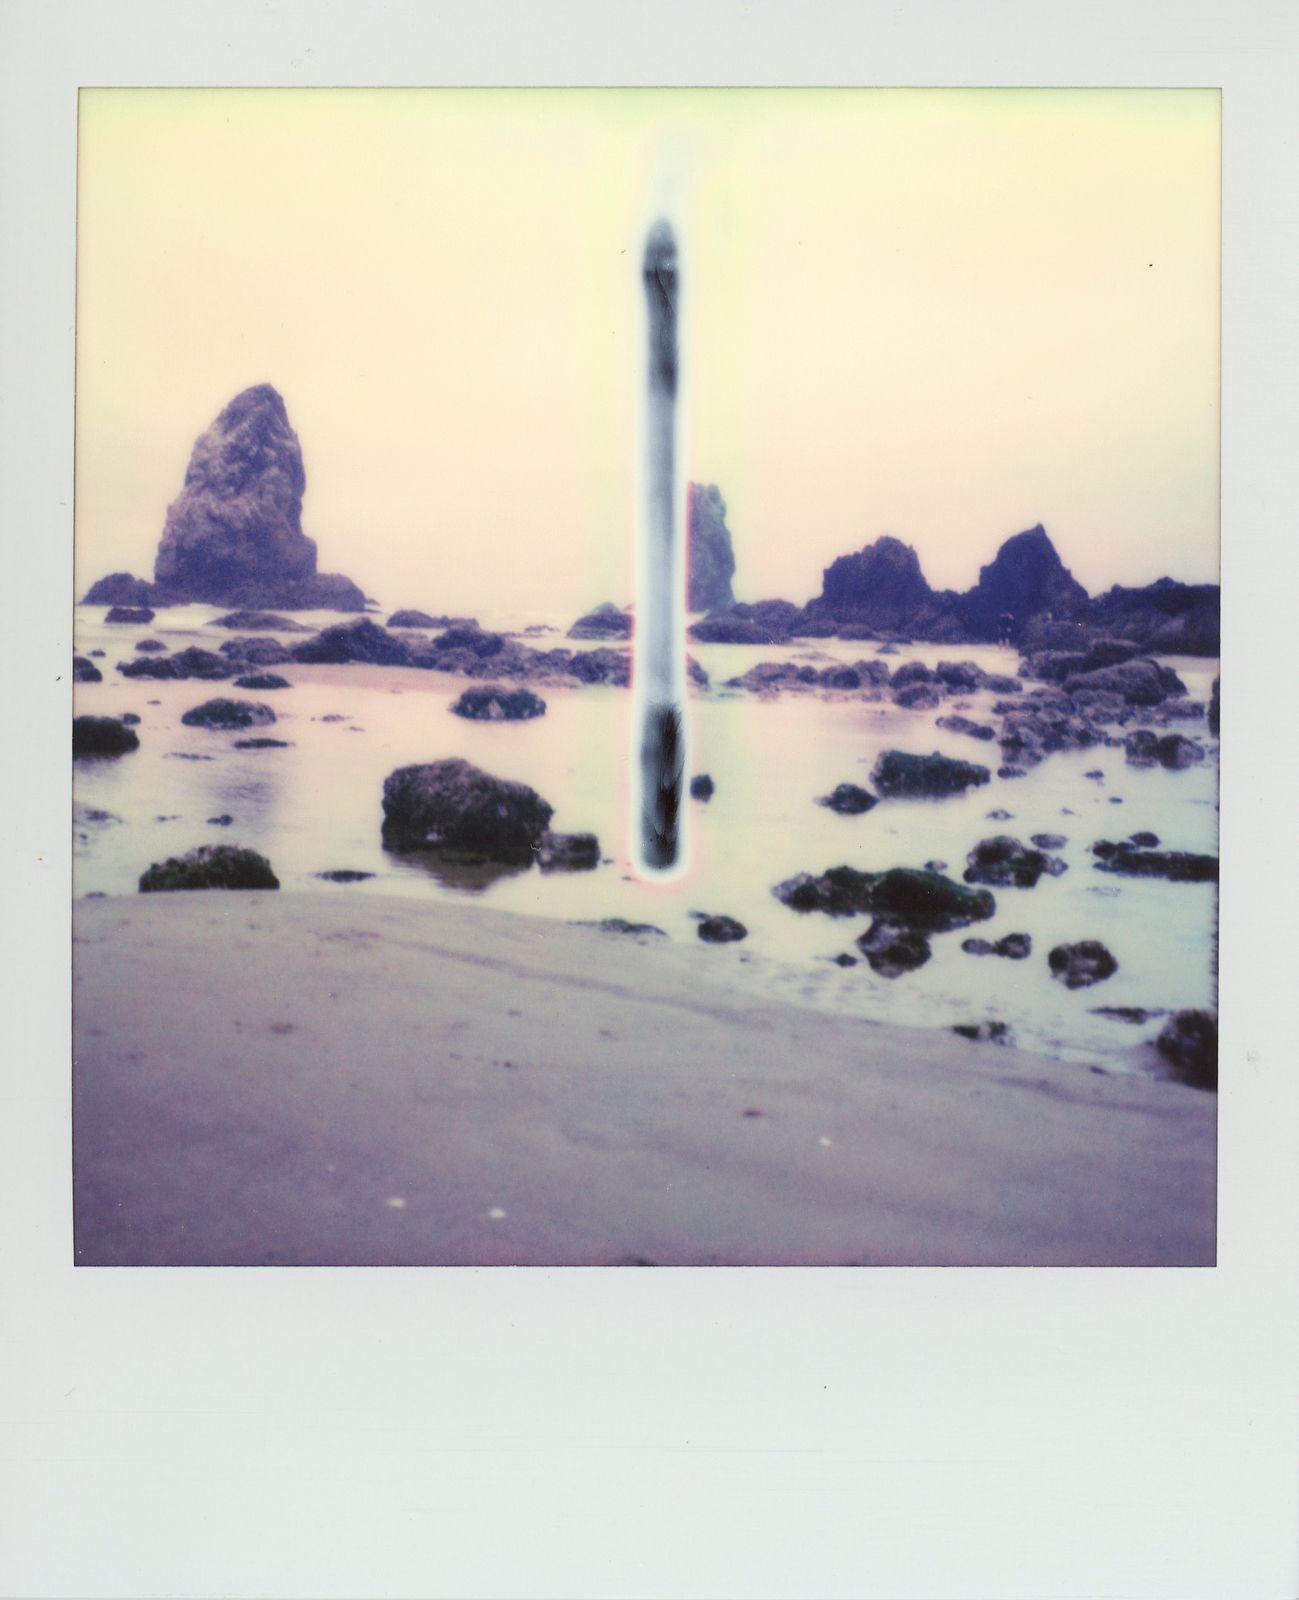 polaroid-0008a.JPG